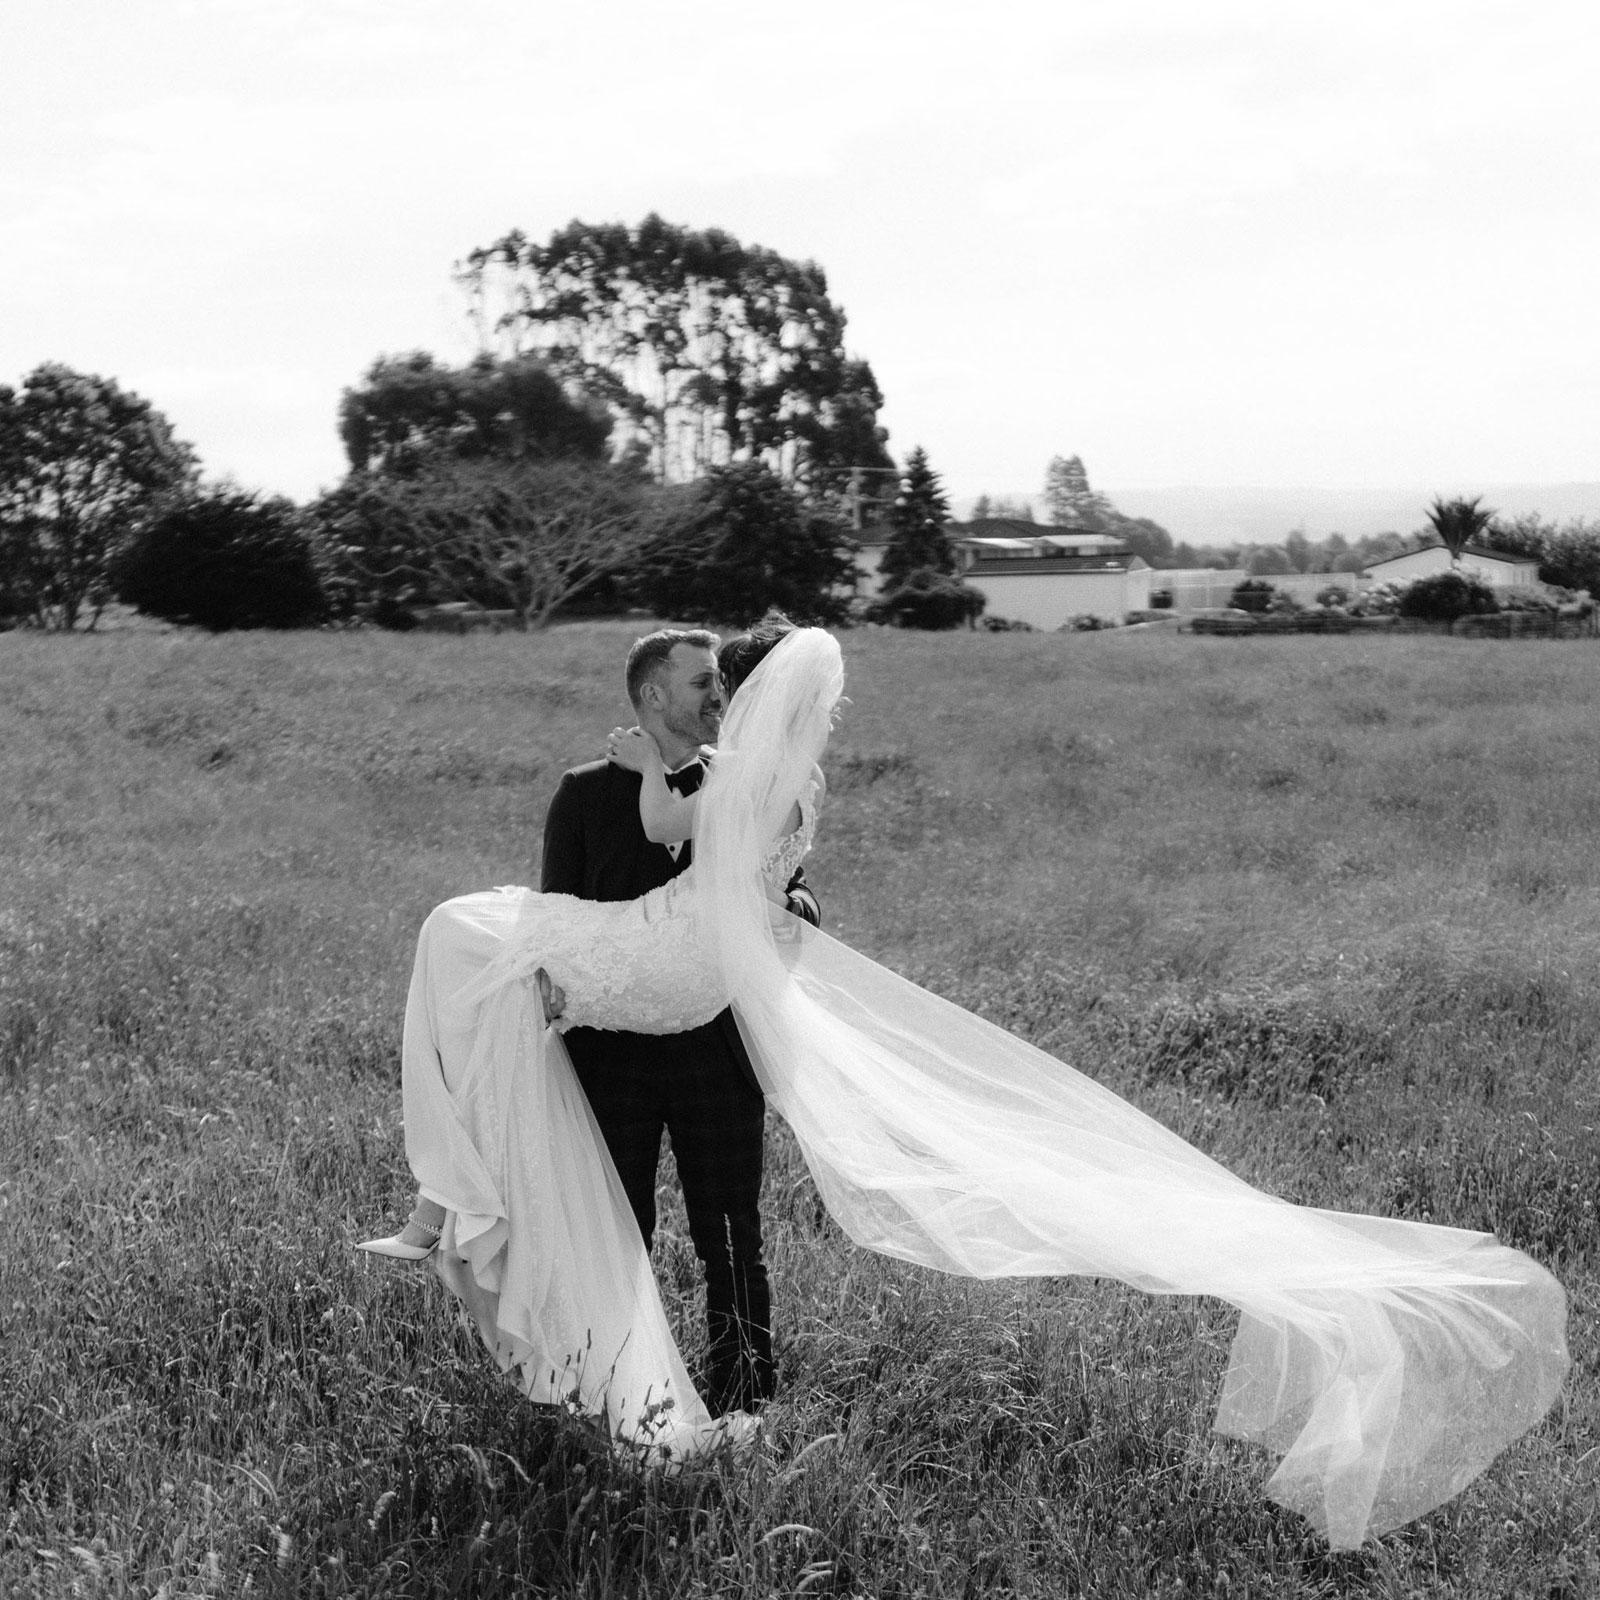 newfound-n-c-olive-tree-cottage-tauranga-wedding-photographer-722